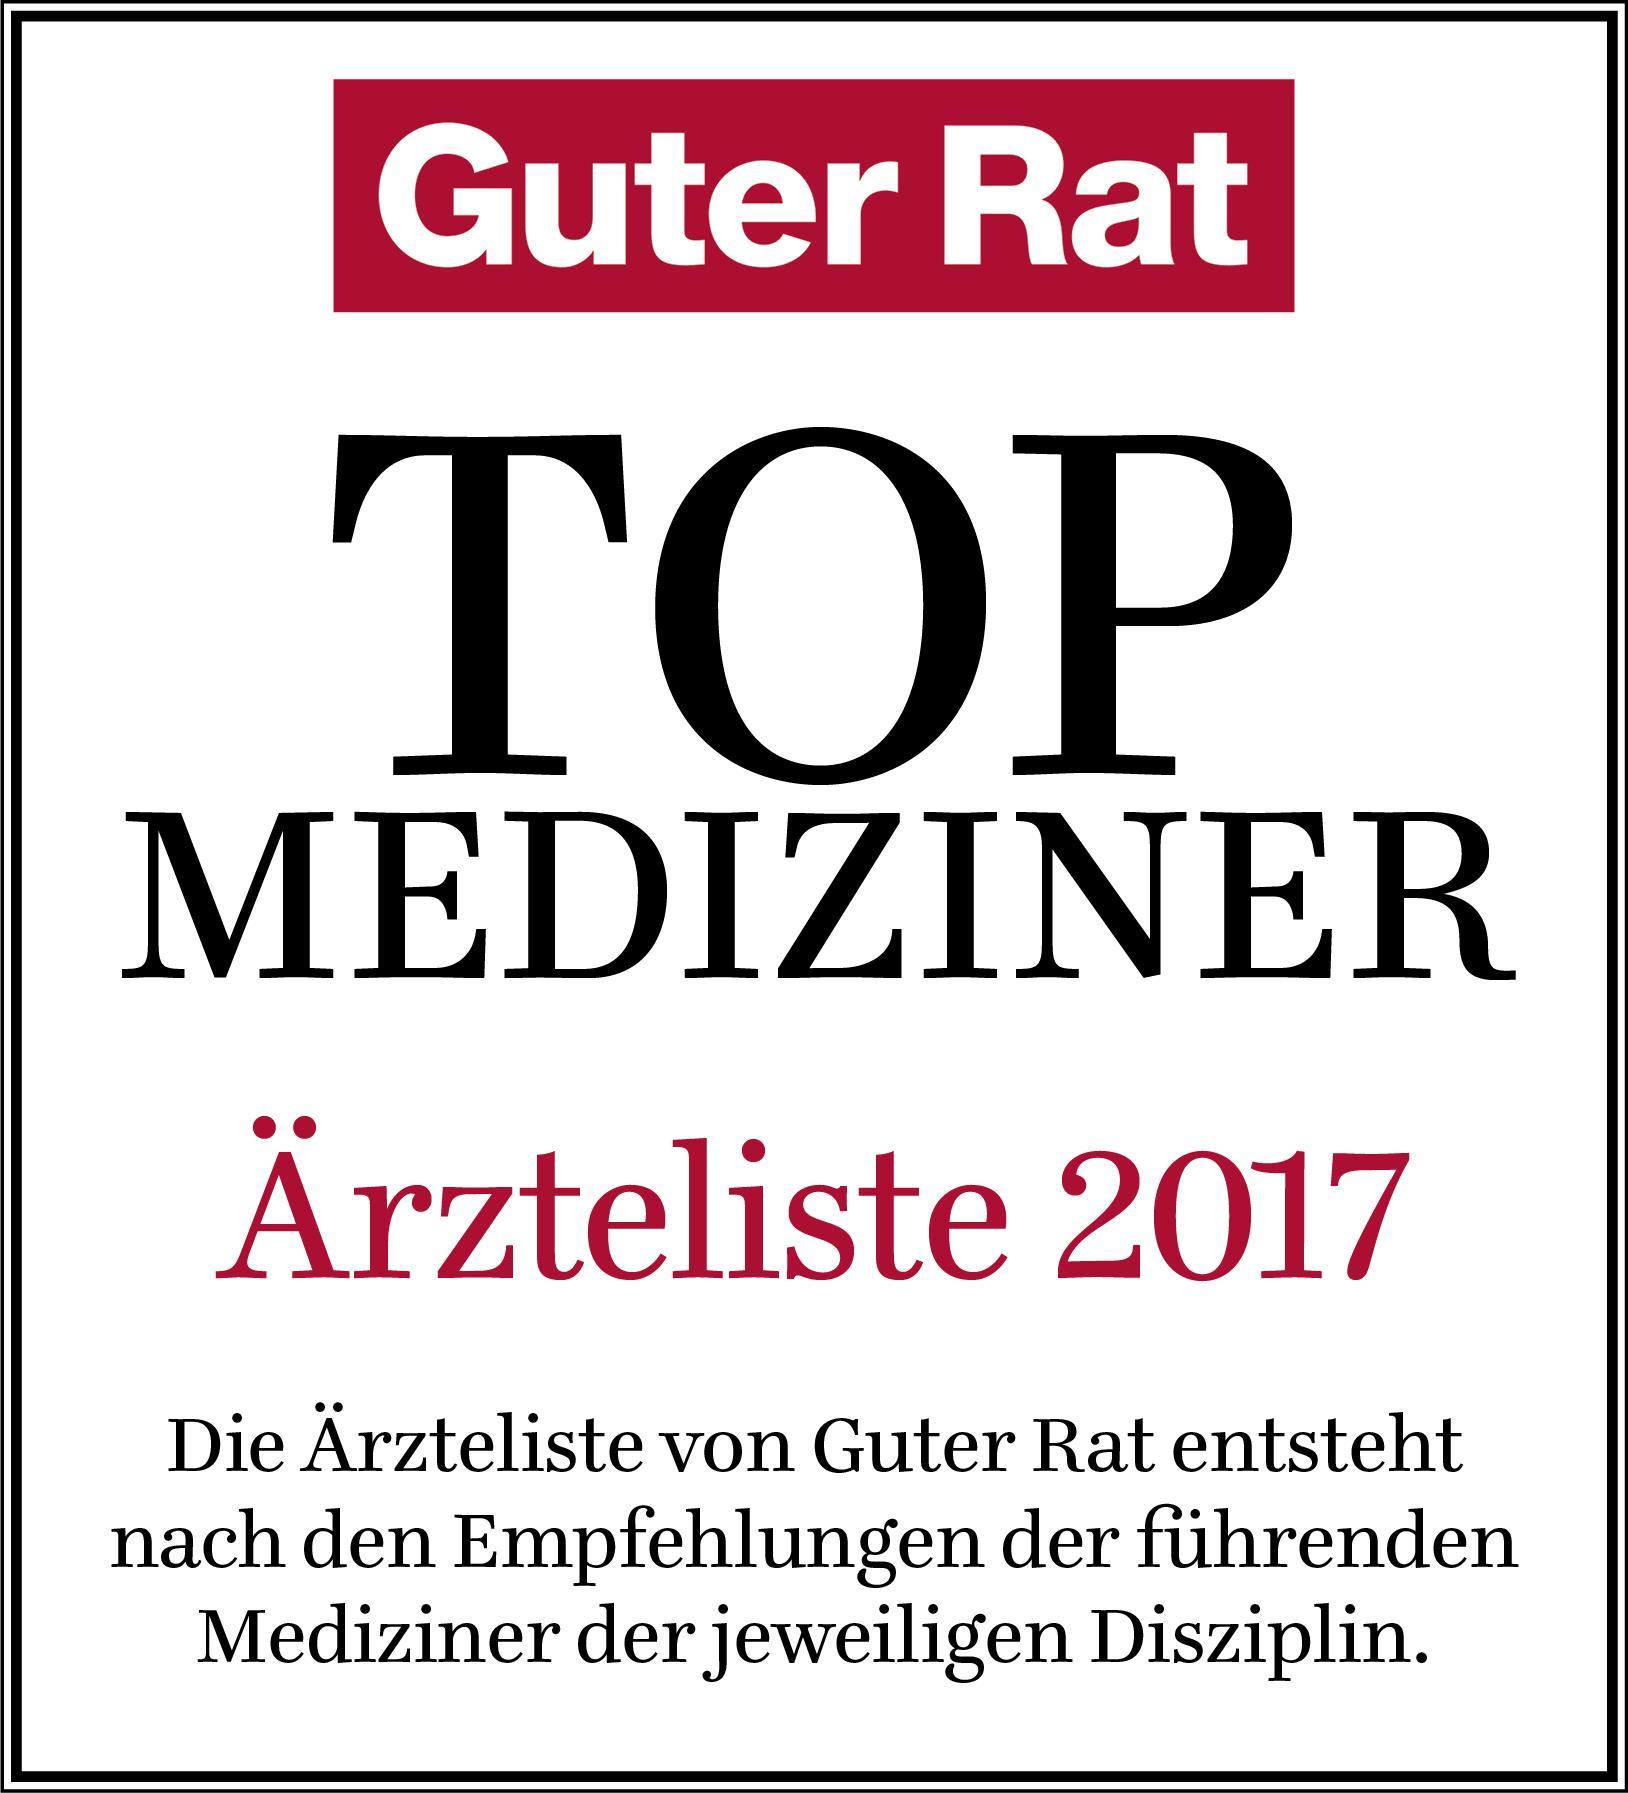 Charmant Bester Lebenslauf Rat Fotos - Entry Level Resume Vorlagen ...